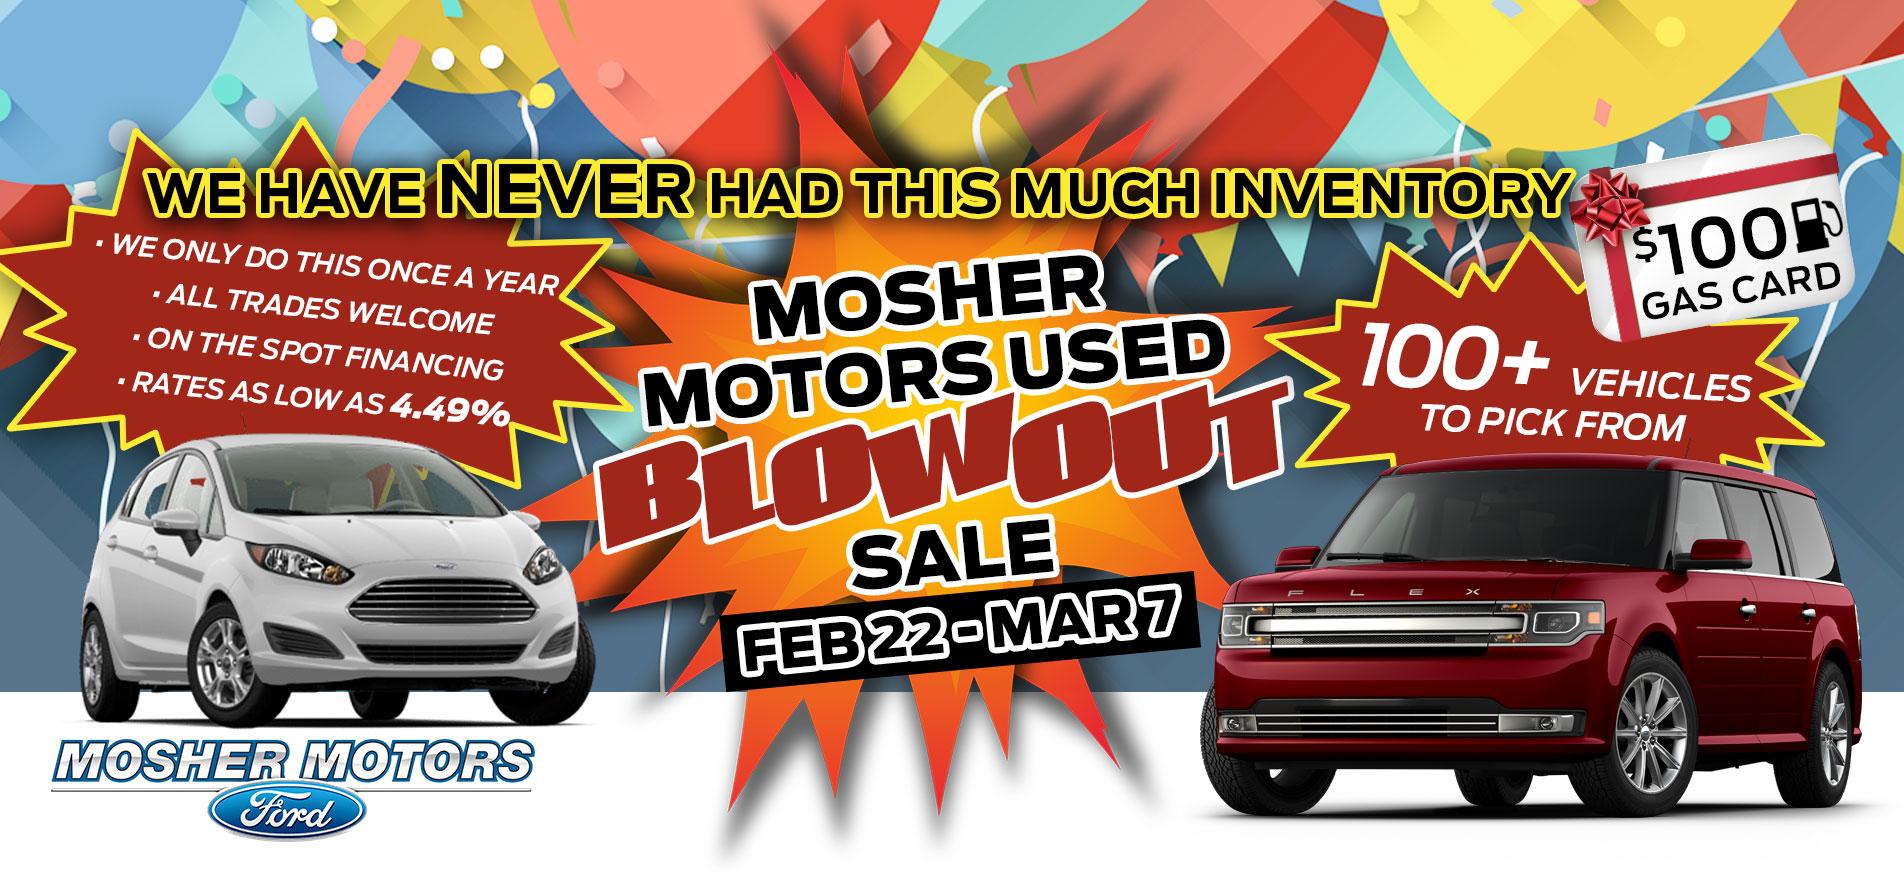 MOSHER MOTORS USED BLOWOUT SALES FEB 22- MAR 7